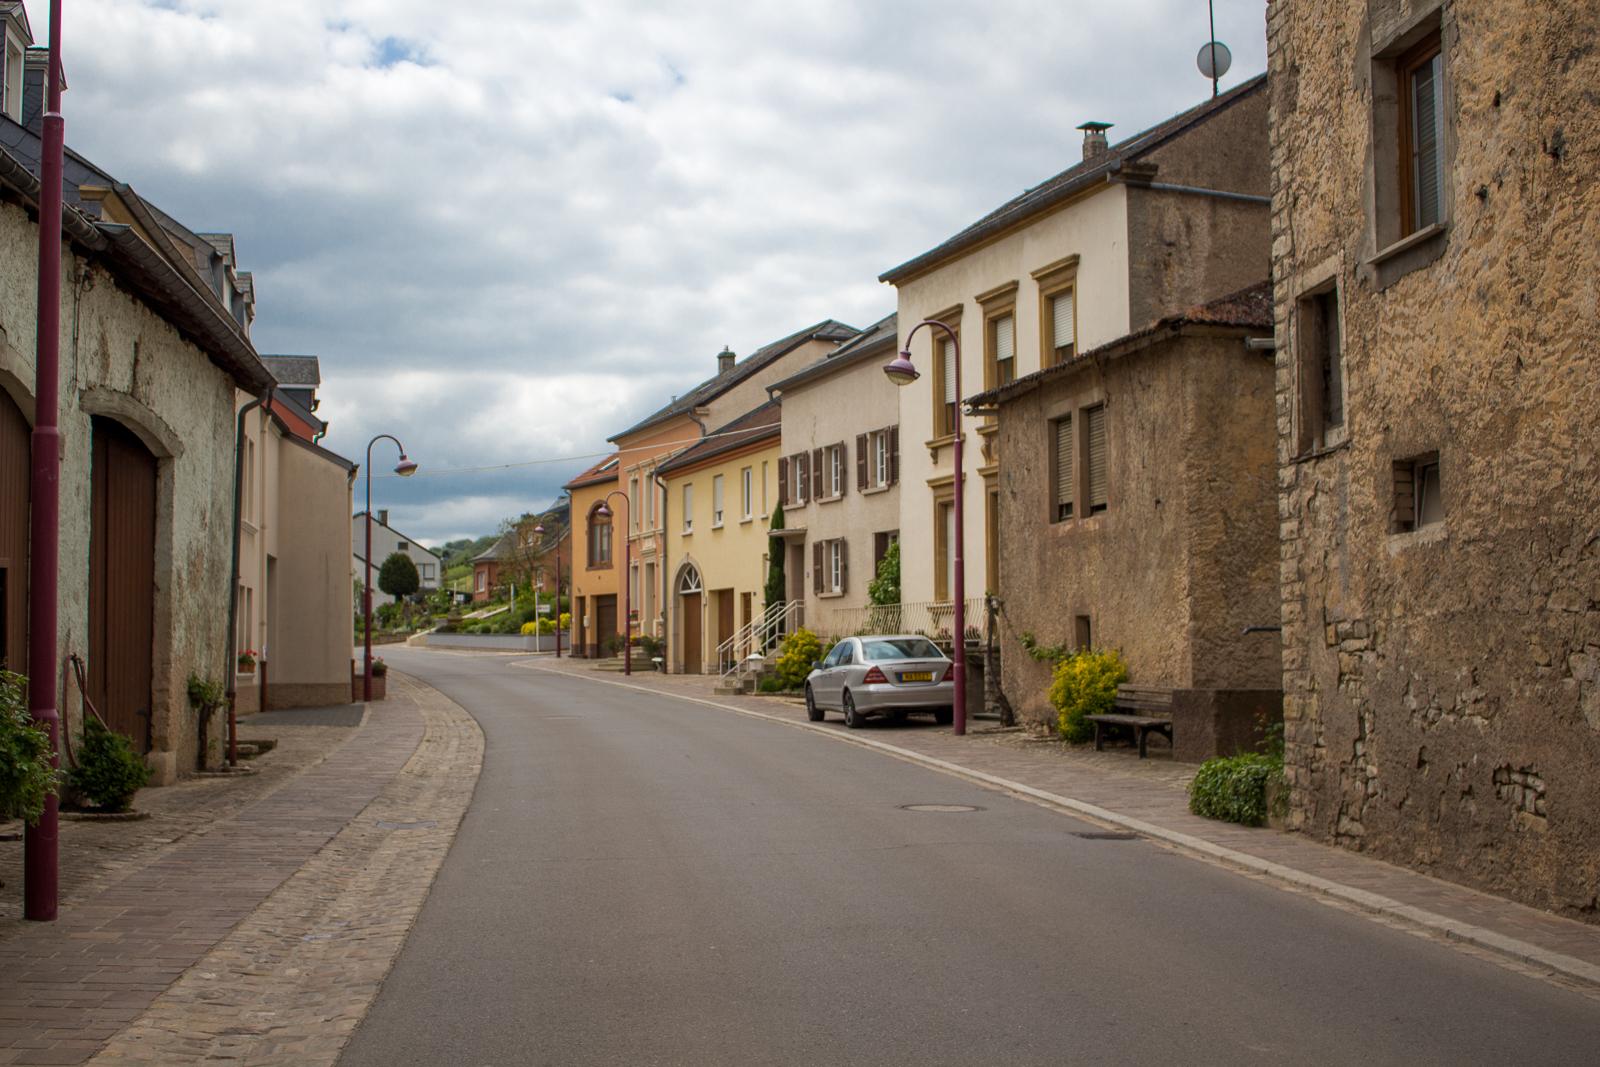 Luxemburg, Luxembourg, Roadtrip, Cabriotour, Mosel, Mosellandschaft, Schwebsange